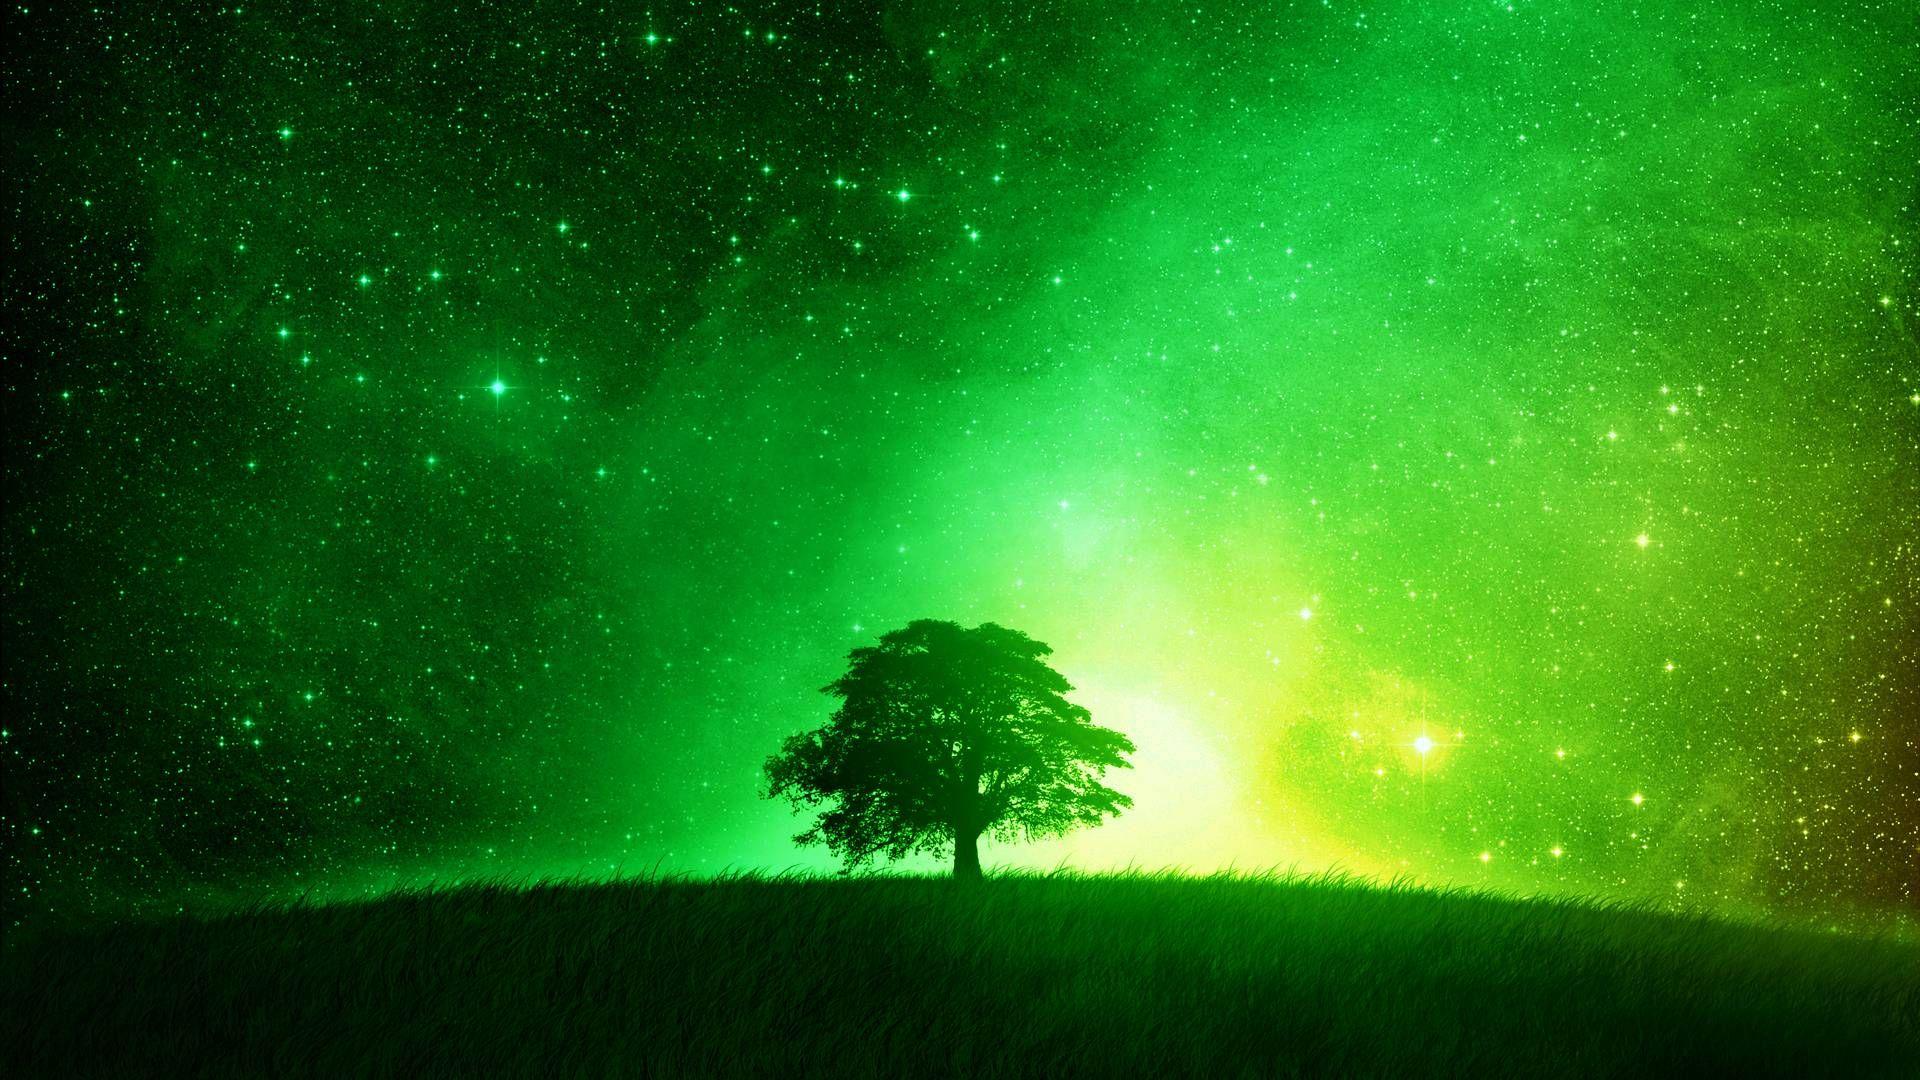 Green Wallpaper 3t Light And Dark Plain 8698 Wallpaper Green